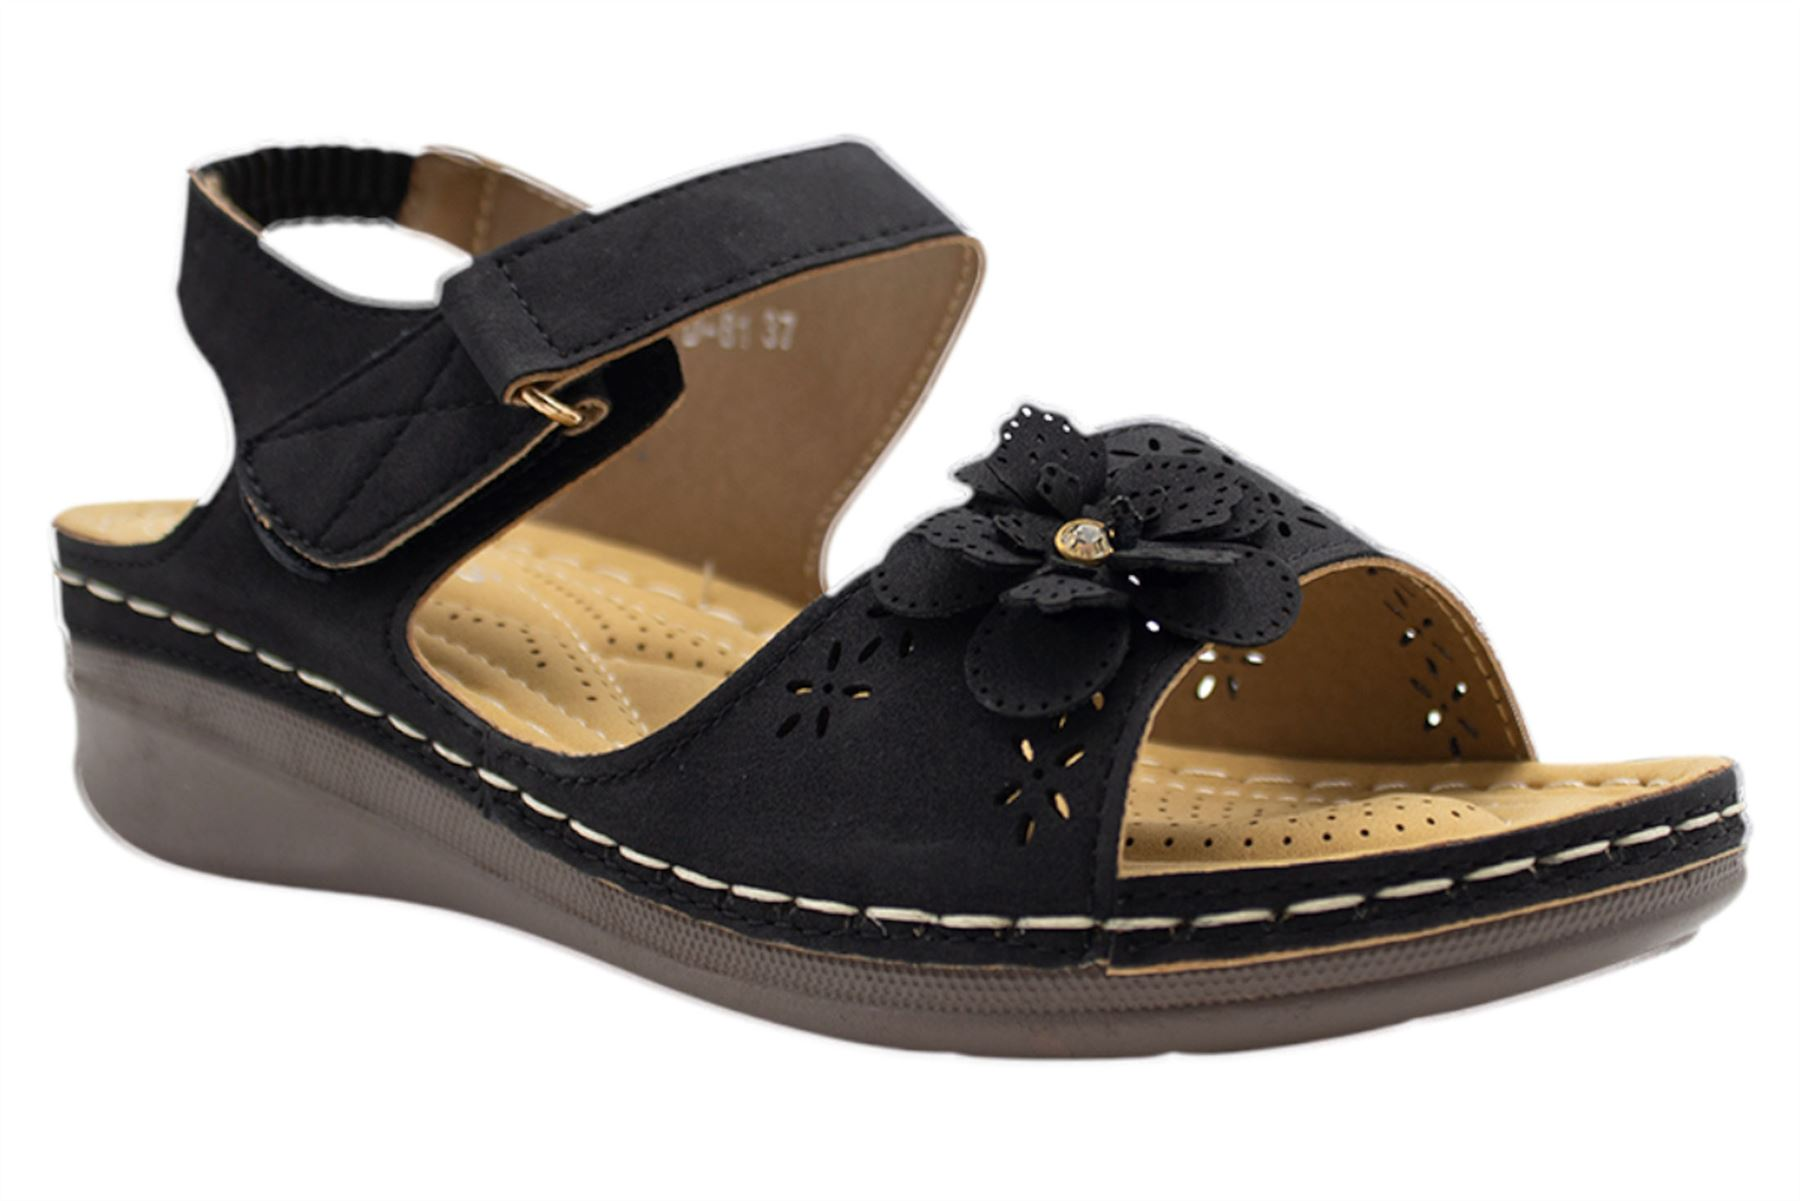 Ladies-Sandals-Womens-Mid-Heel-Comfort-Summer-Beach-Casual-Wear miniatura 13